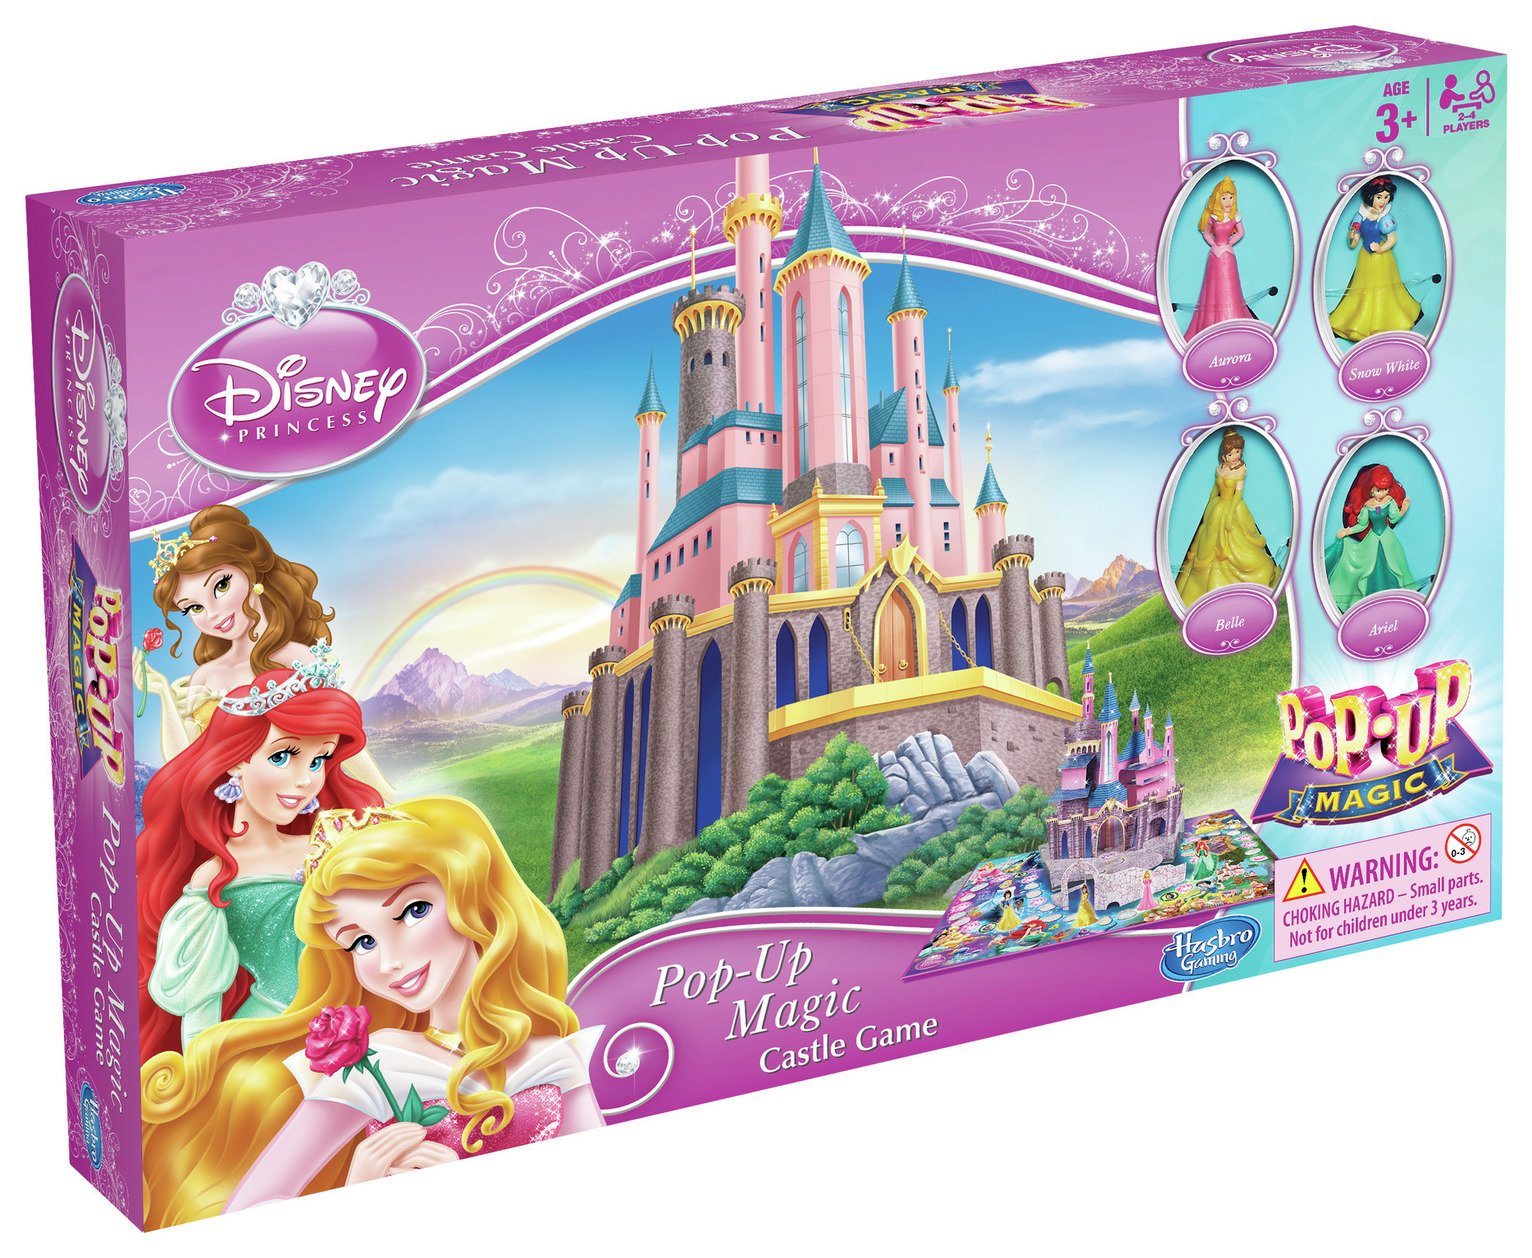 Image of Disney Princess Pop Up Magic Cinderella's Castle Game.